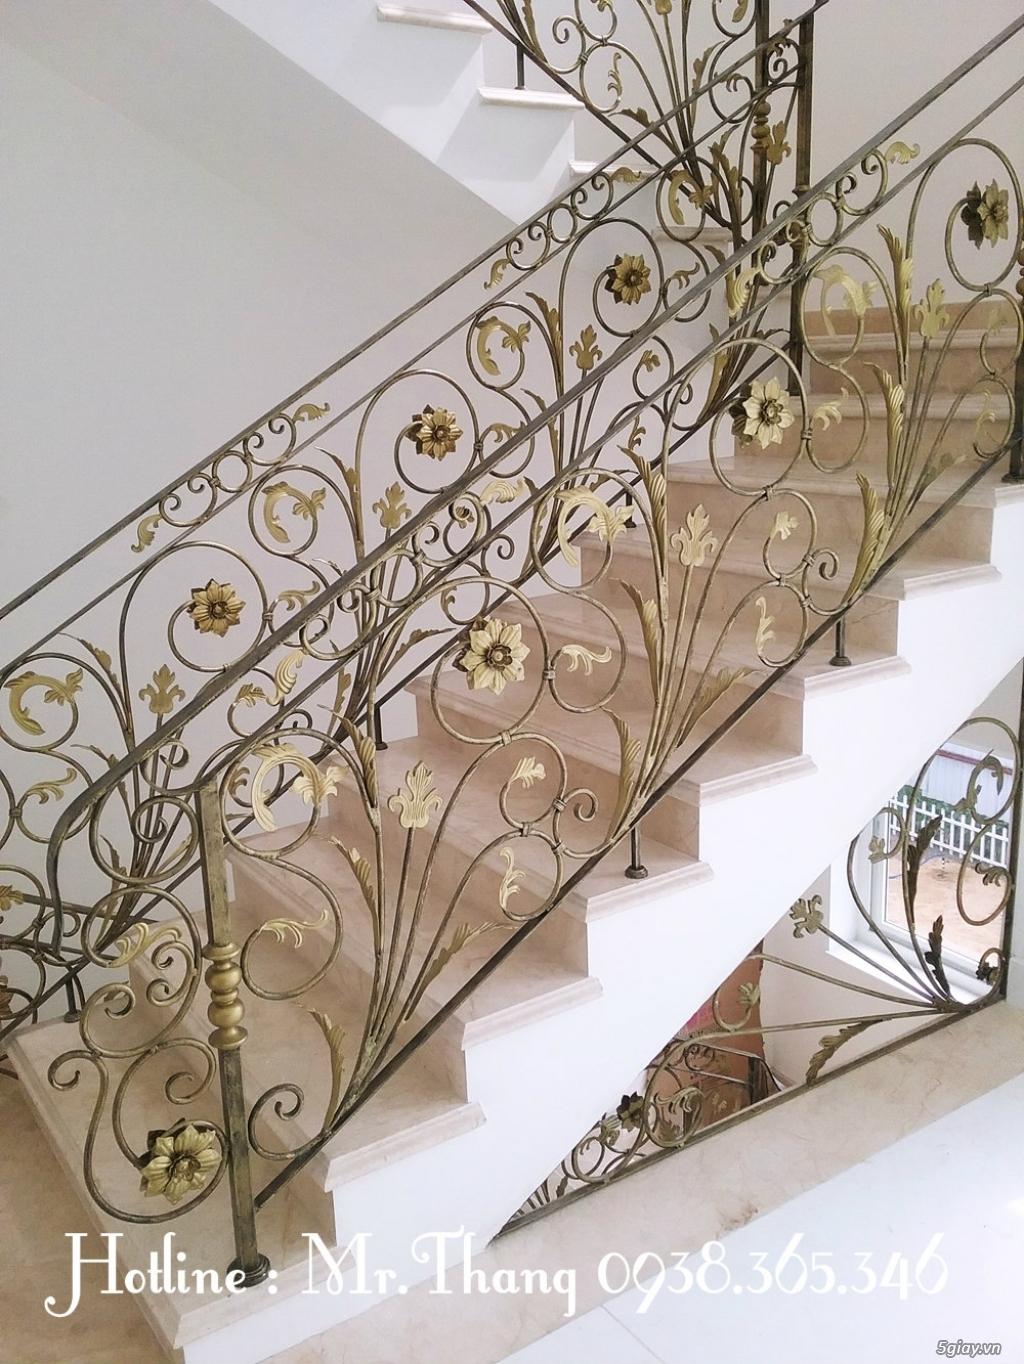 Cầu thang sắt mỹ thuật đẹp - 3